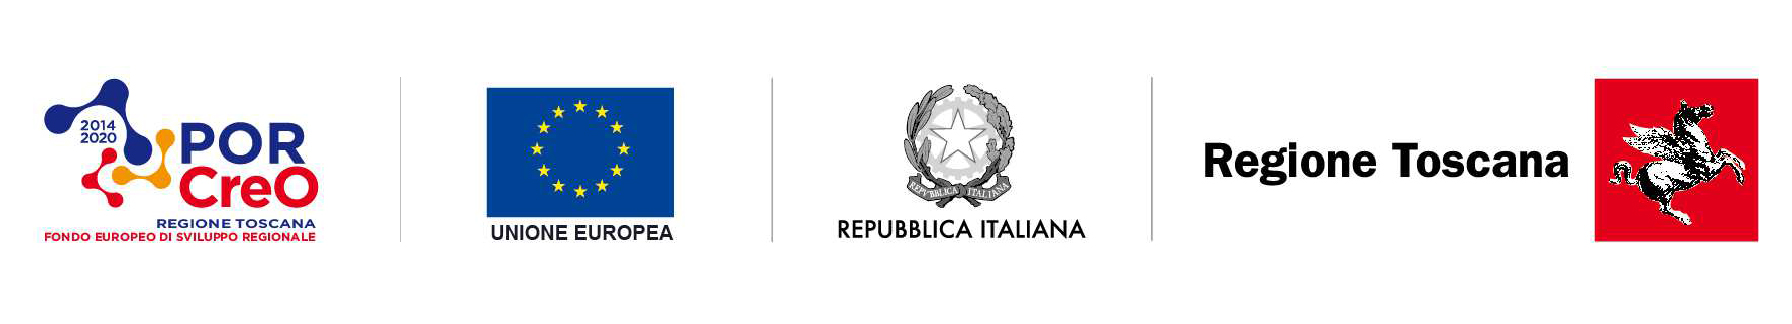 Scaffali Metallici Calenzano.Etermet Scaffalature Metalliche E Armadi Metallici